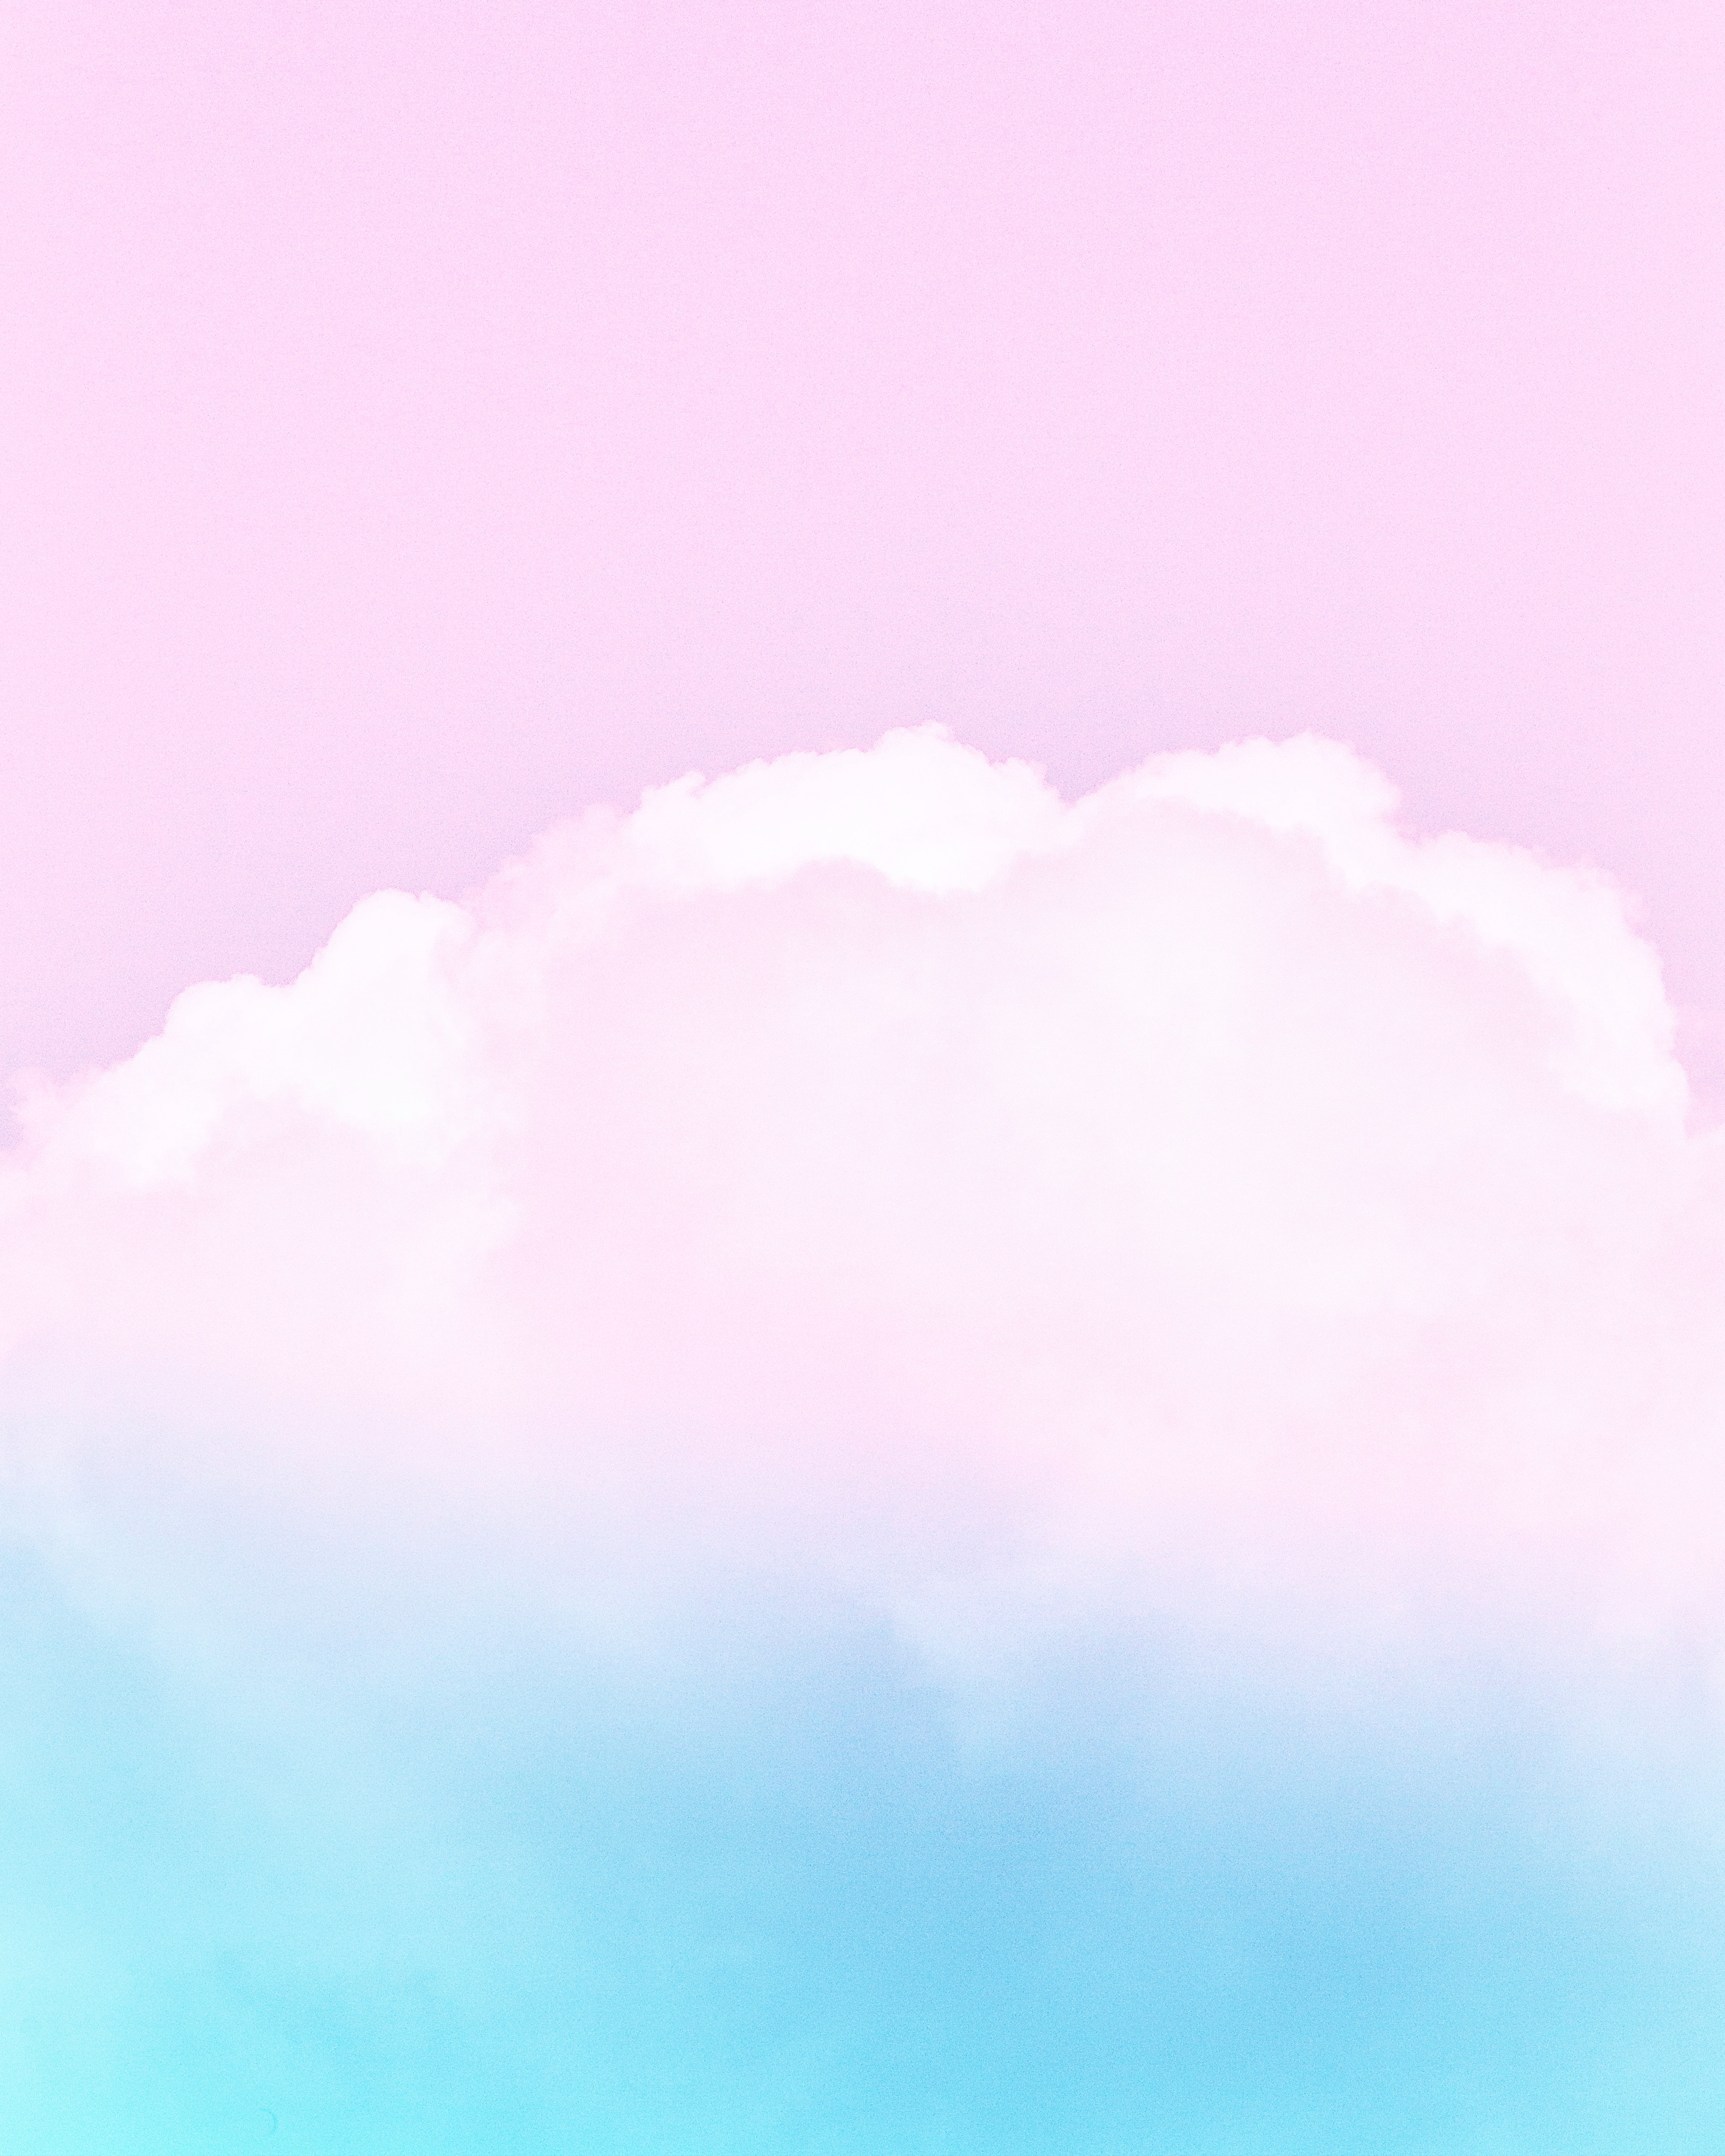 63+ Gambar Awan Pink Terbaik